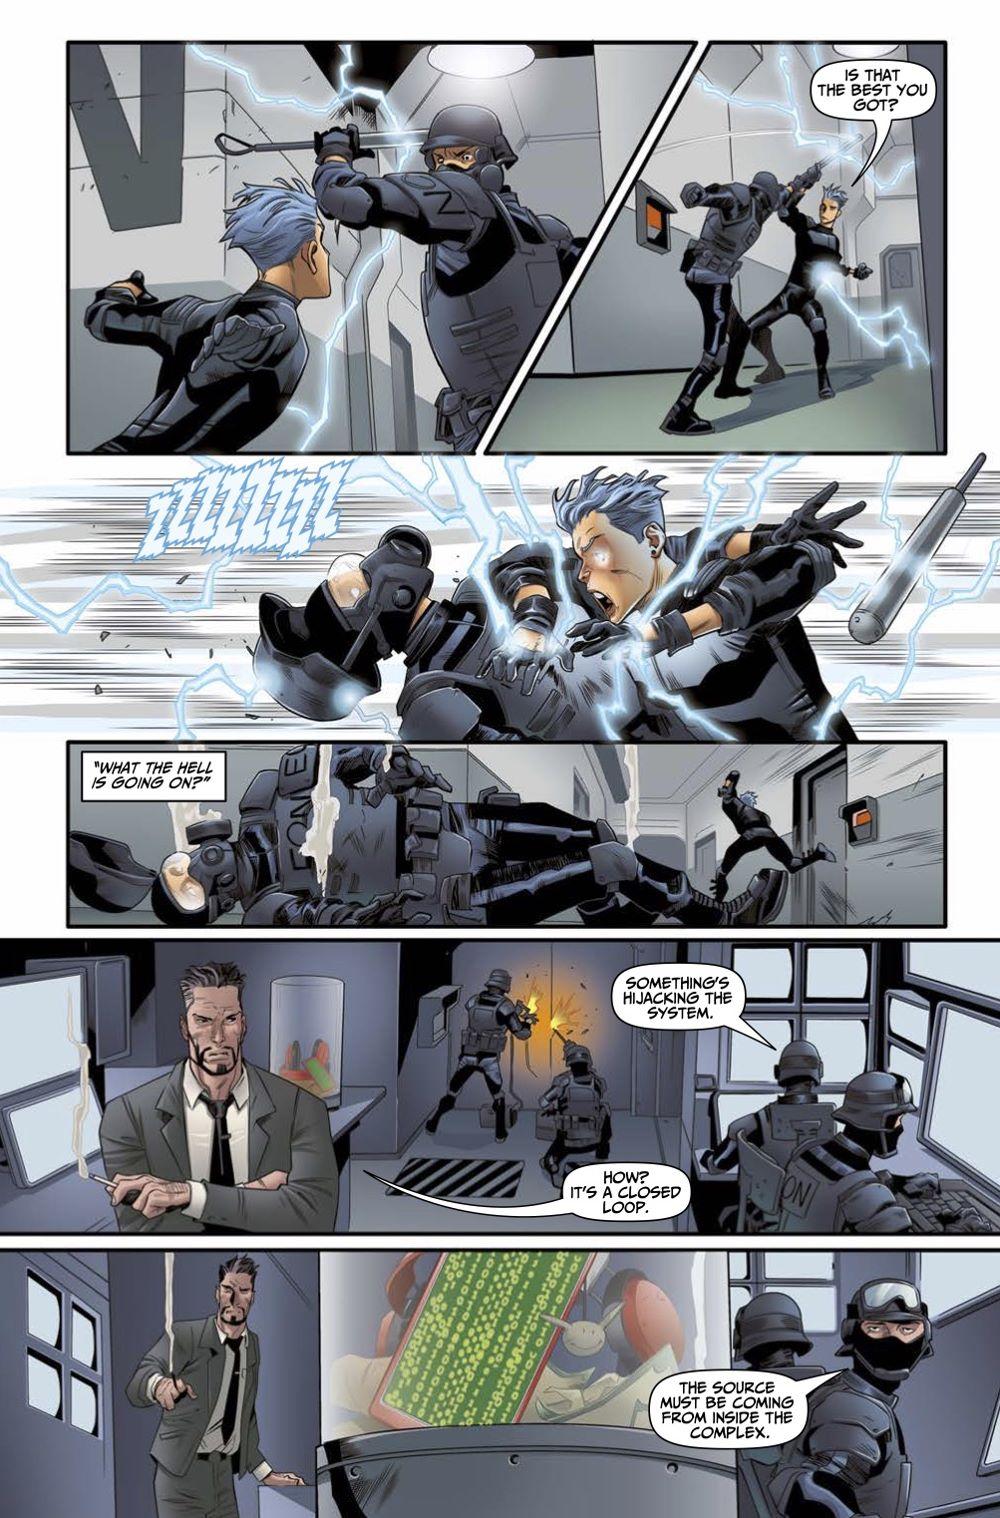 ExtraOrdinary-4-Page-2 ComicList Previews: EXTRAORDINARY #4